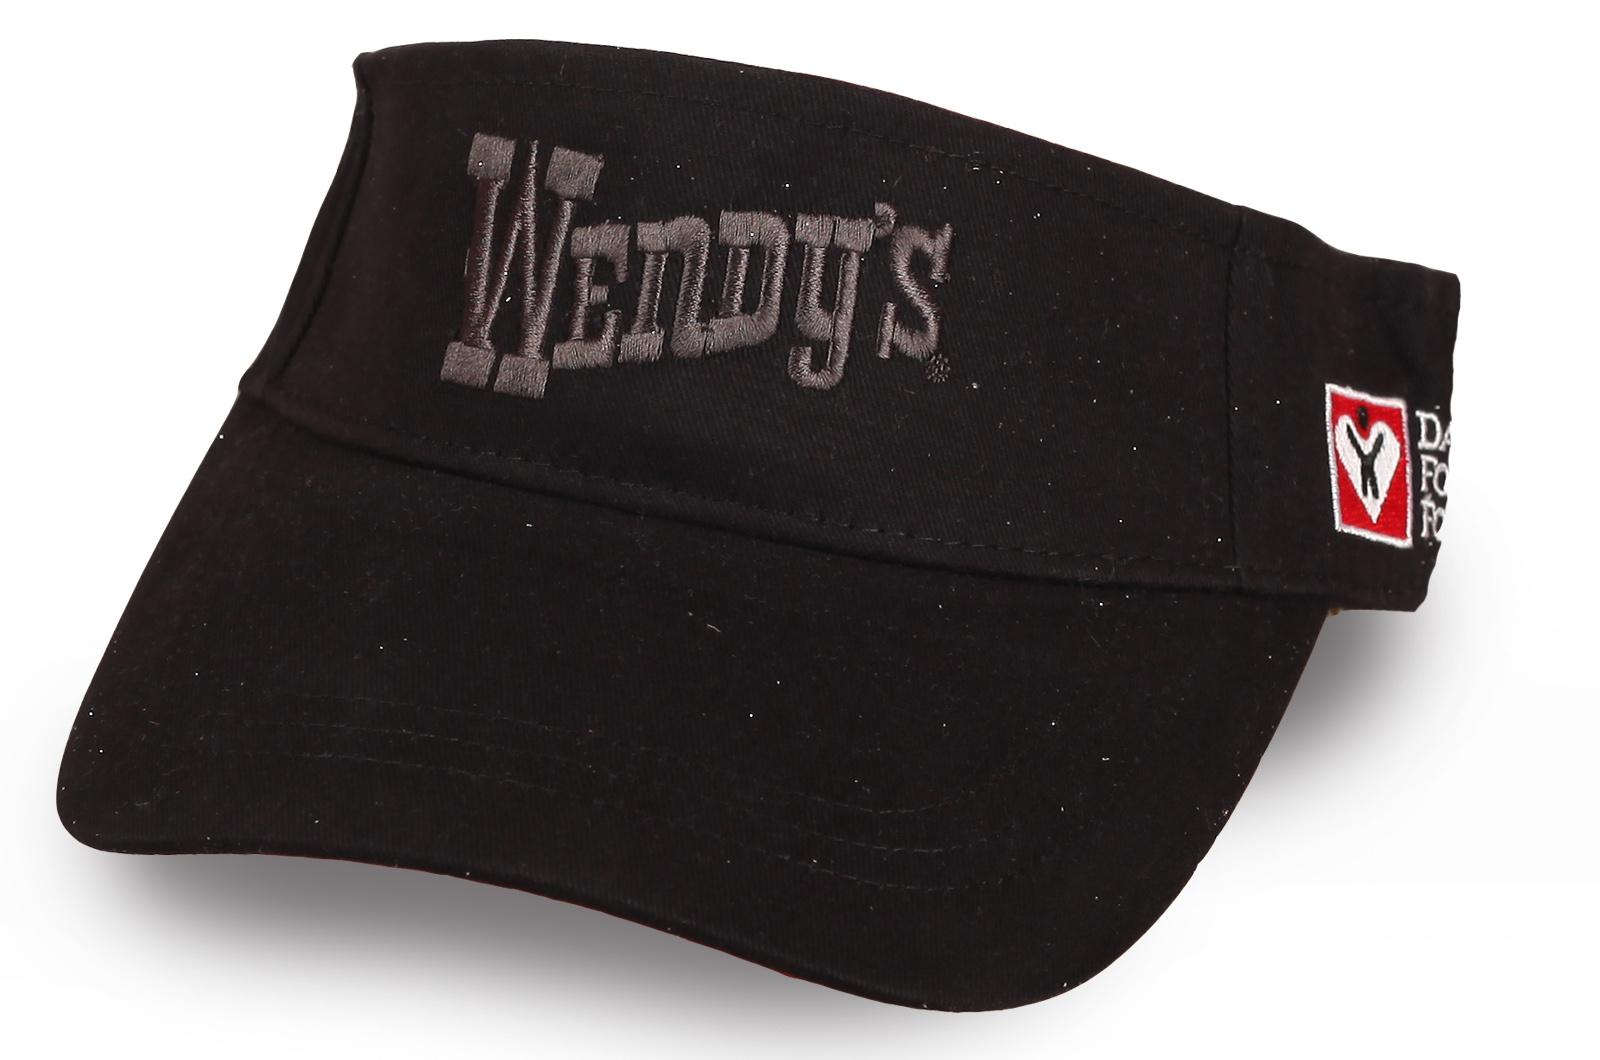 Кепка тенниска Wendy's - купить онлайн